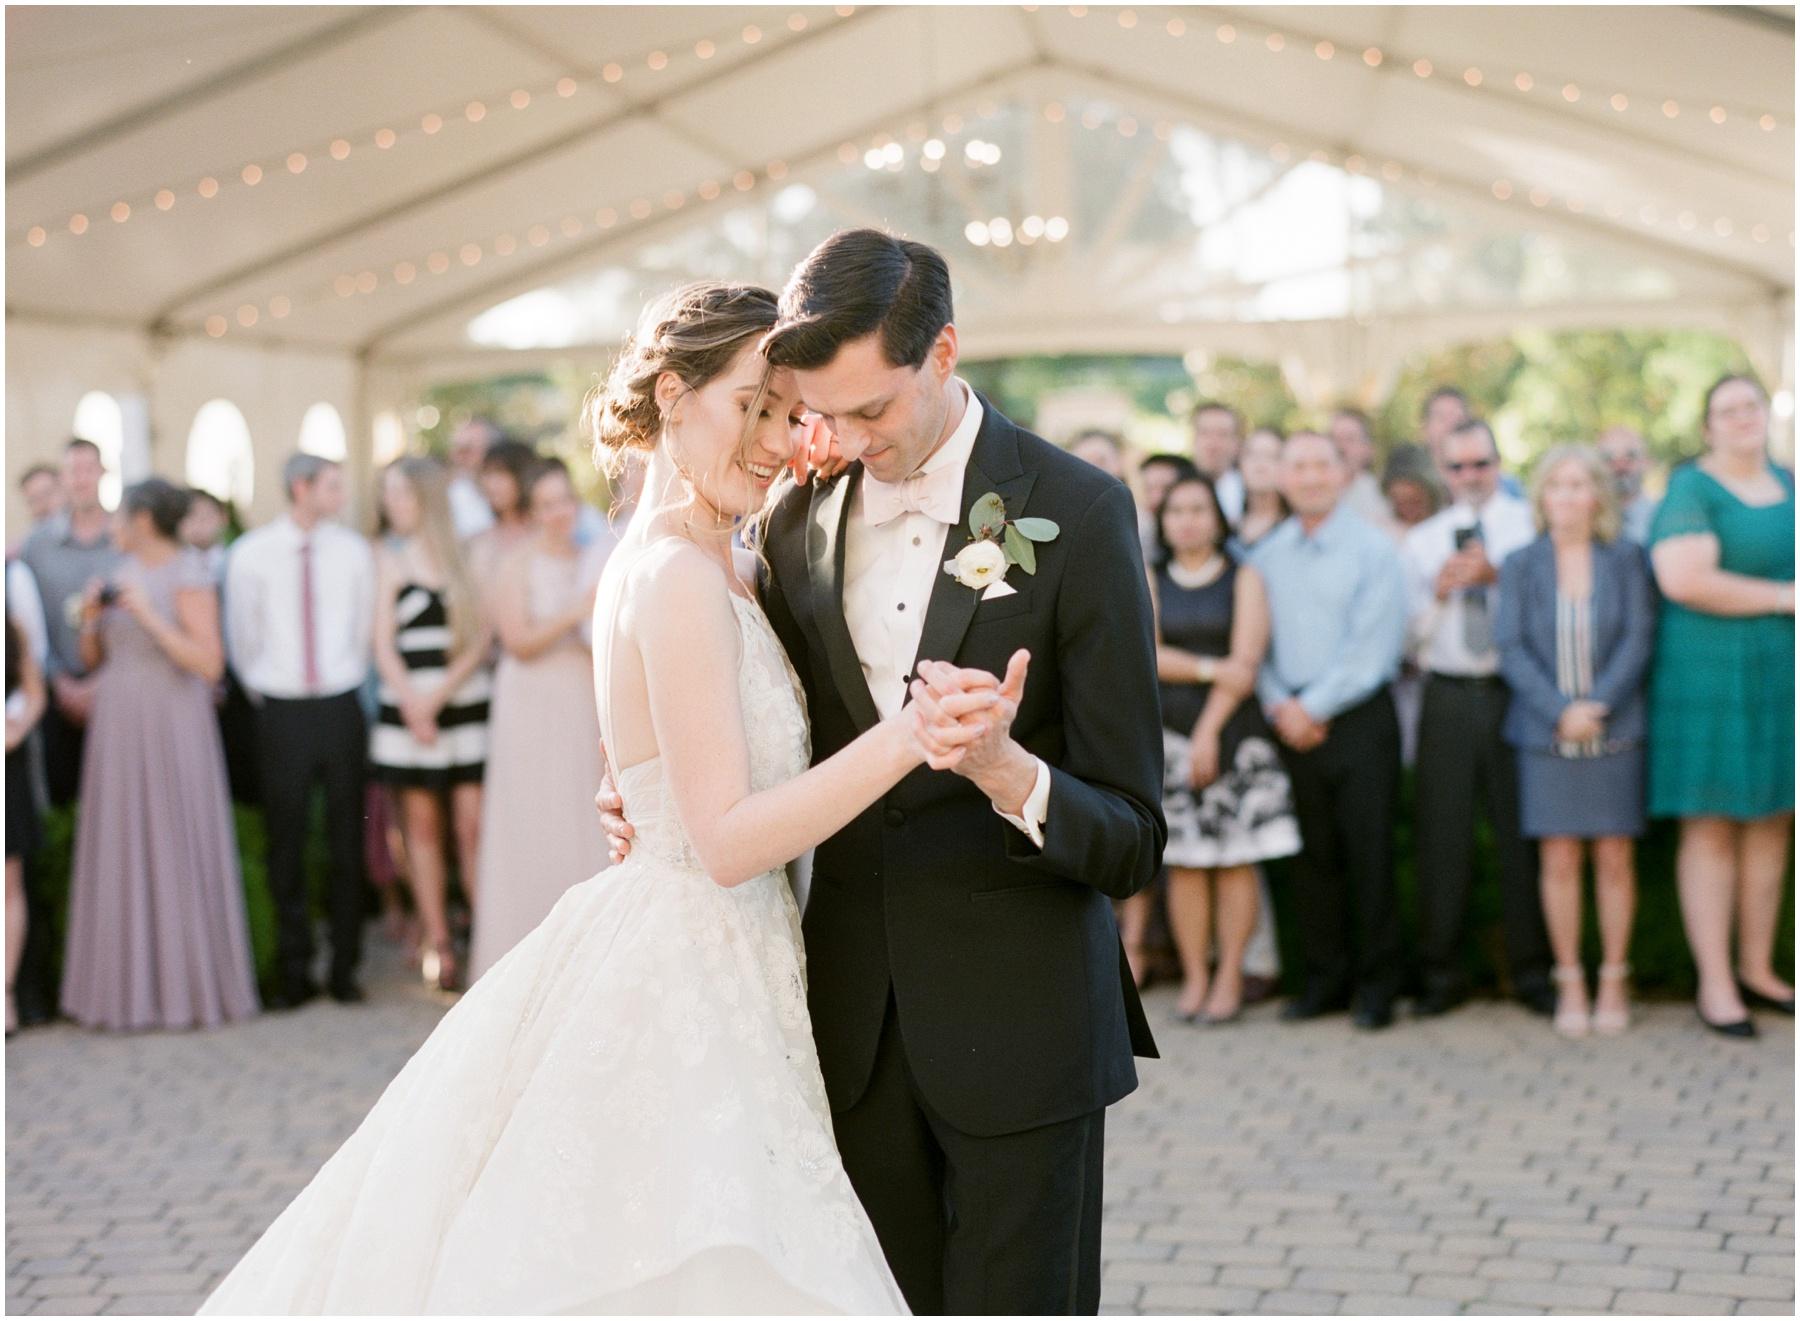 Scribner-bend-vineyards-wedding-sacramento-california-Kristine-Herman-Photography-46.jpg